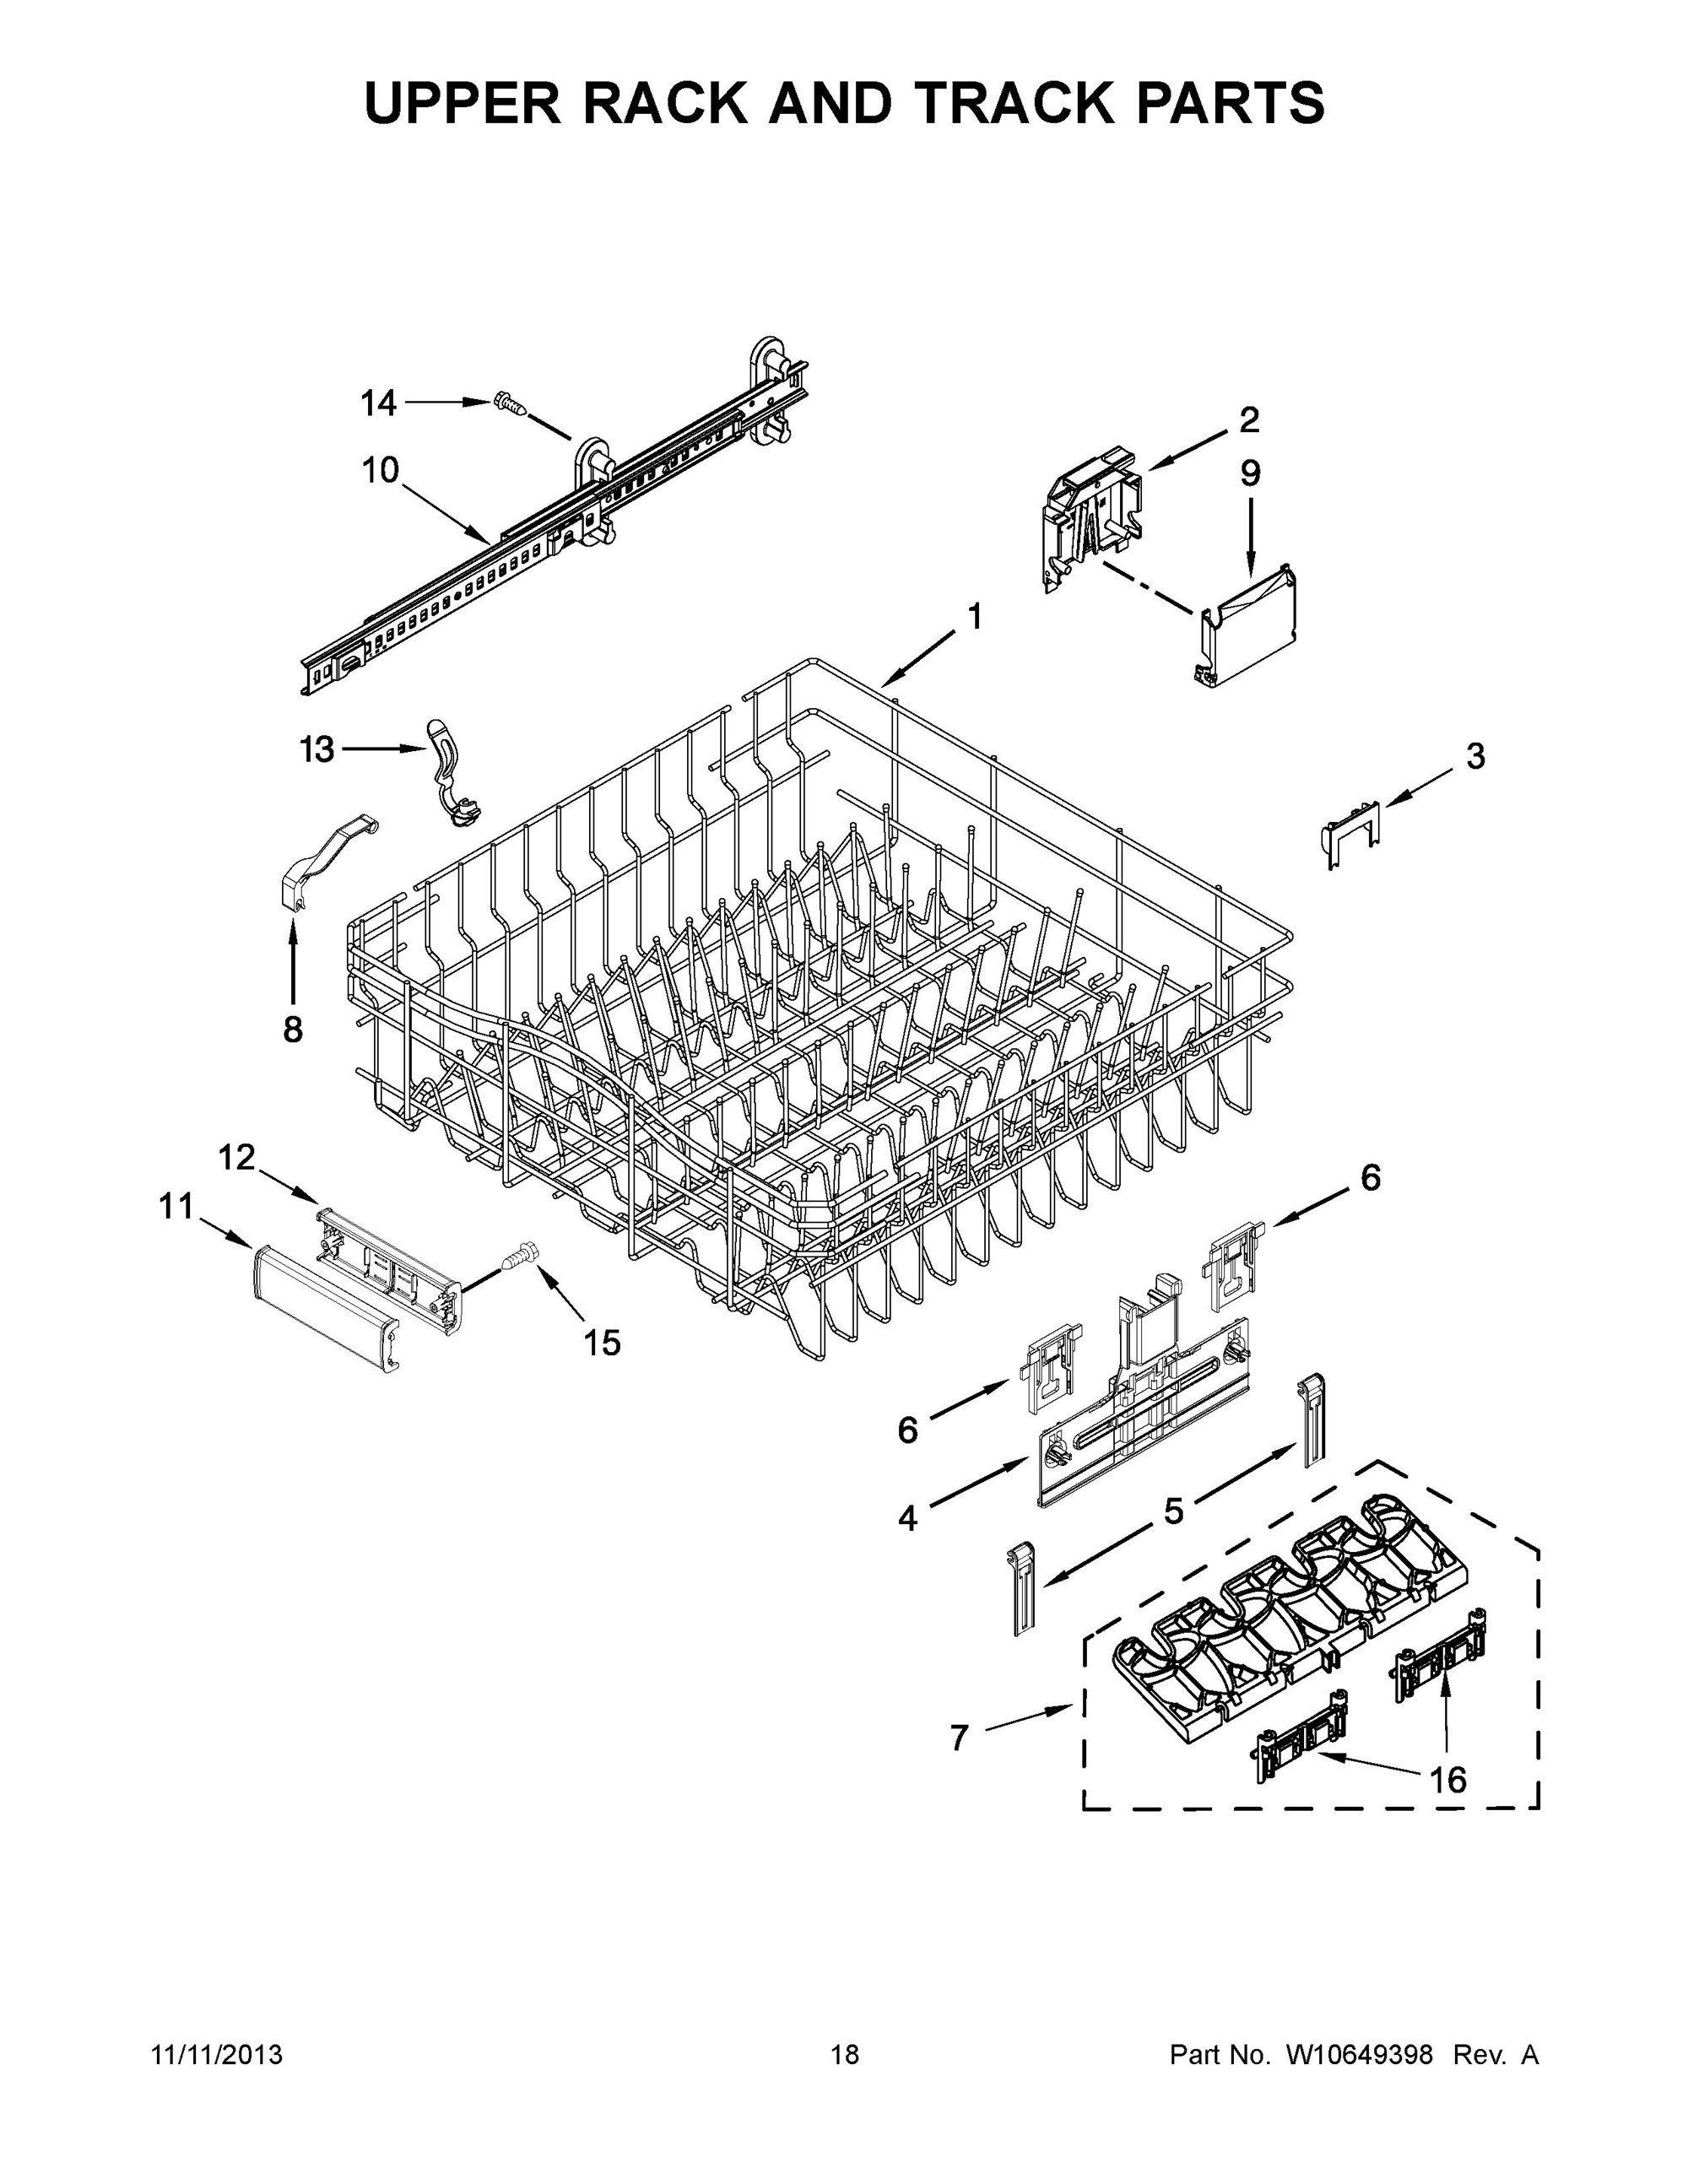 Kdte204dss0 upper rack and track parts undercounter dishwasher kitchenaid whirlpool - Kitchenaid dishwasher upper rack parts ...